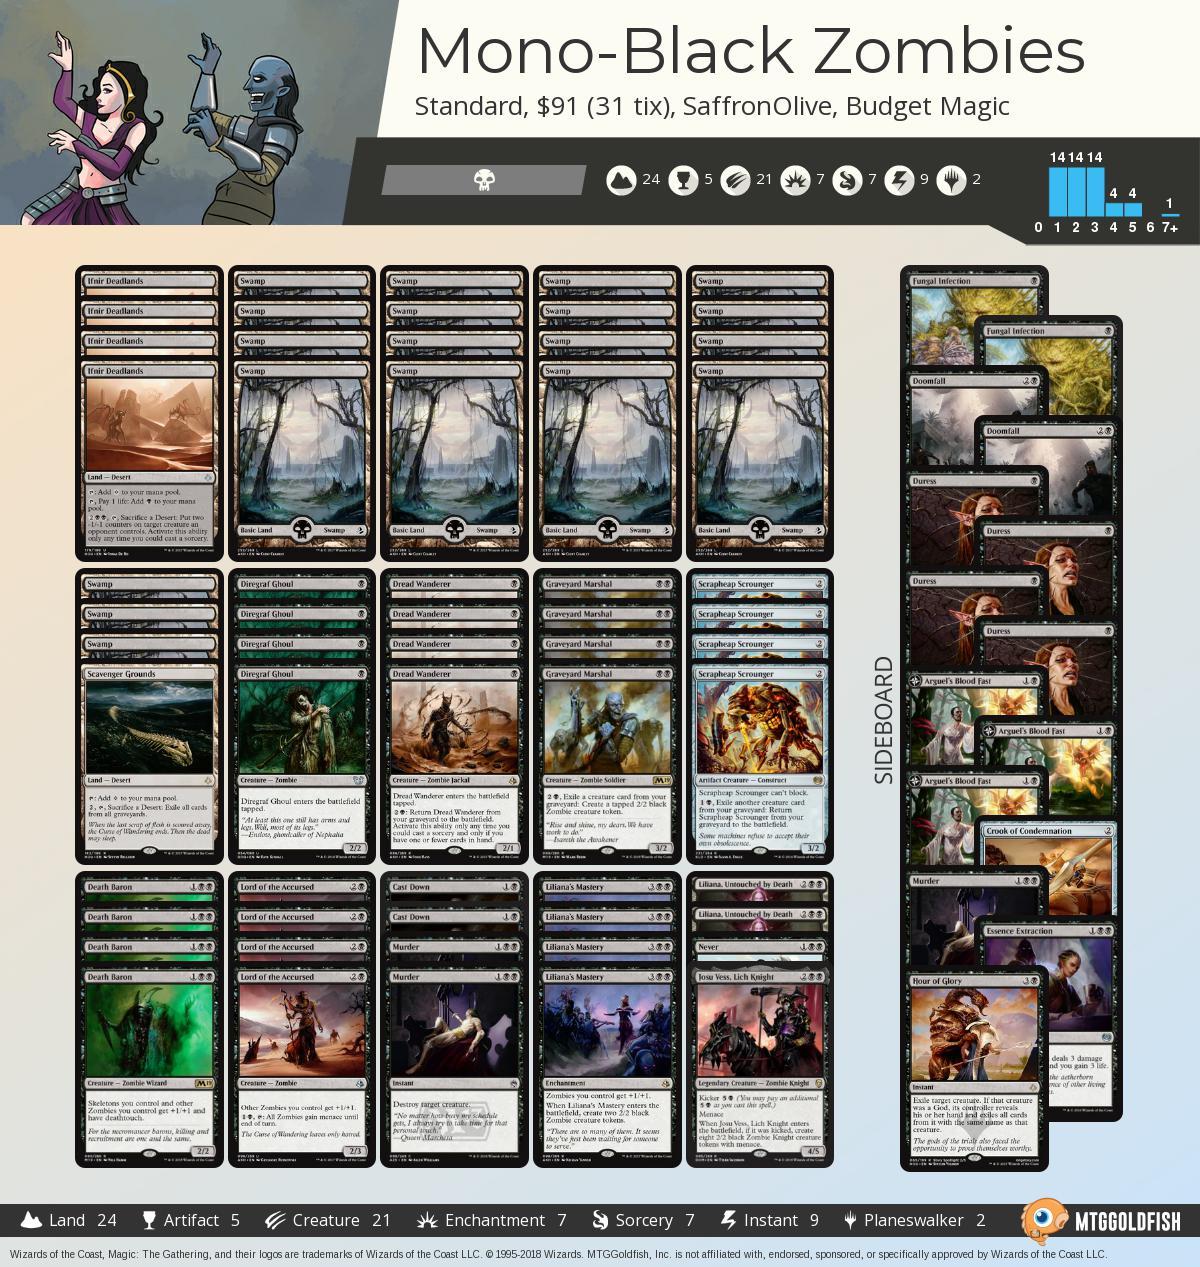 Mono black%2bzombies b39643be 1427 4054 8188 6b422a4a4dd8%2ejpg